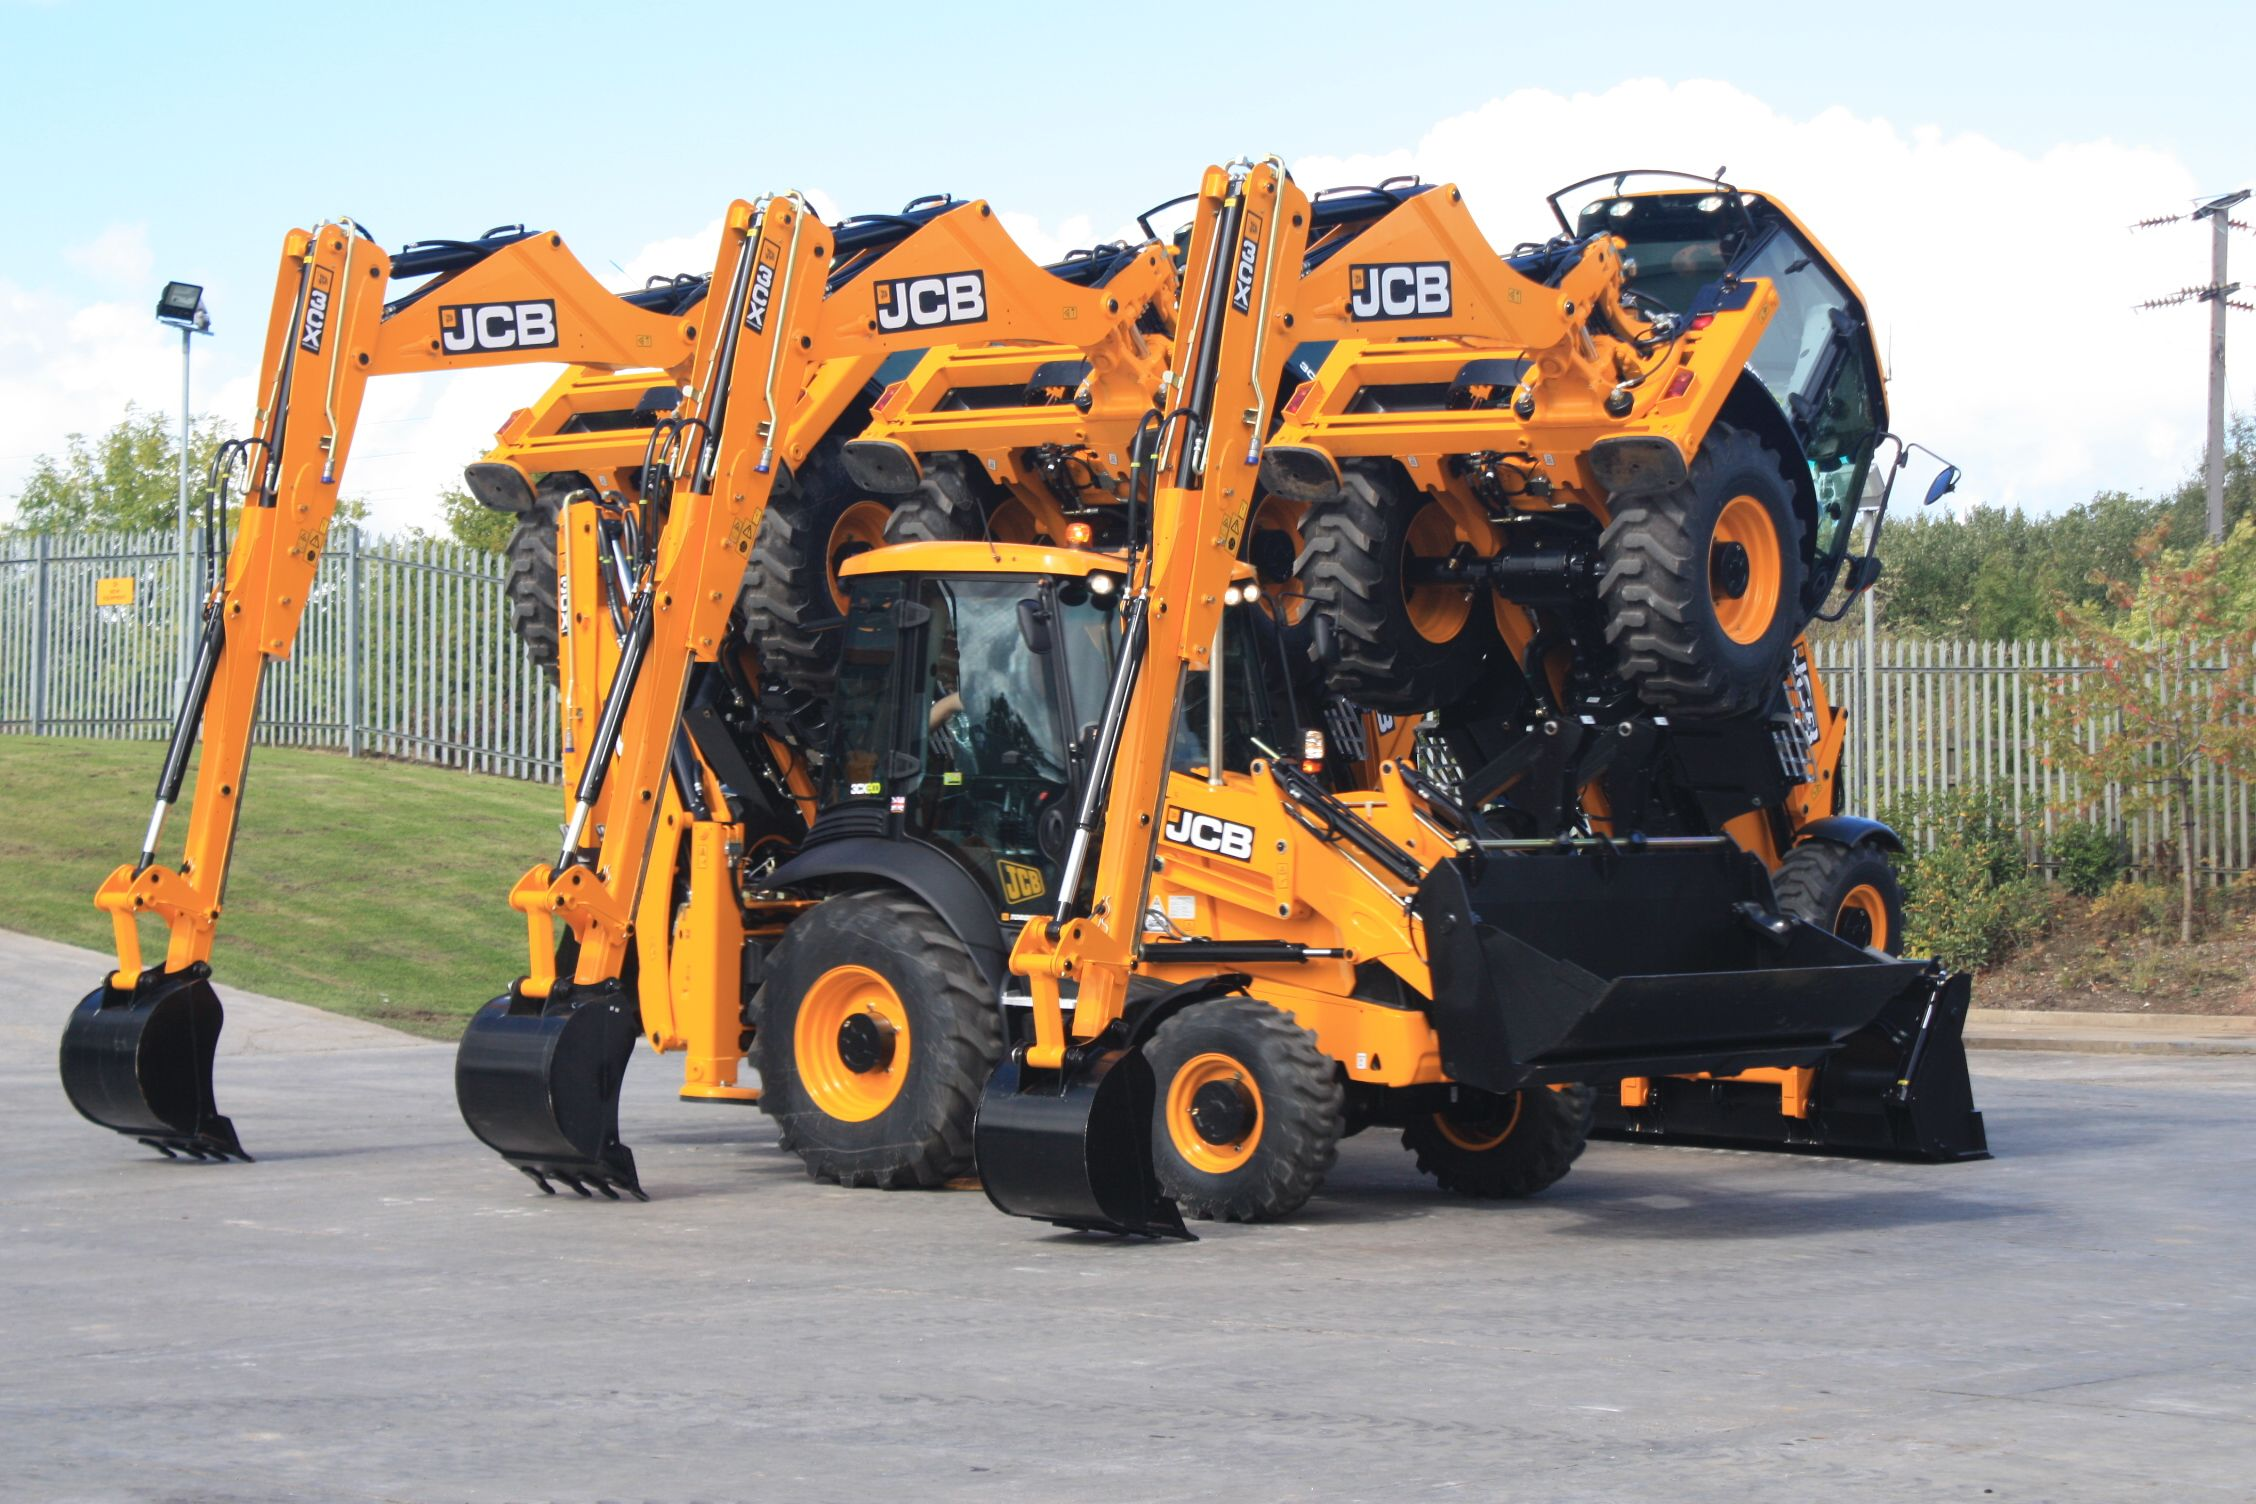 JCB   x4   JCB Tractors &equipment   Heavy machinery, Construction